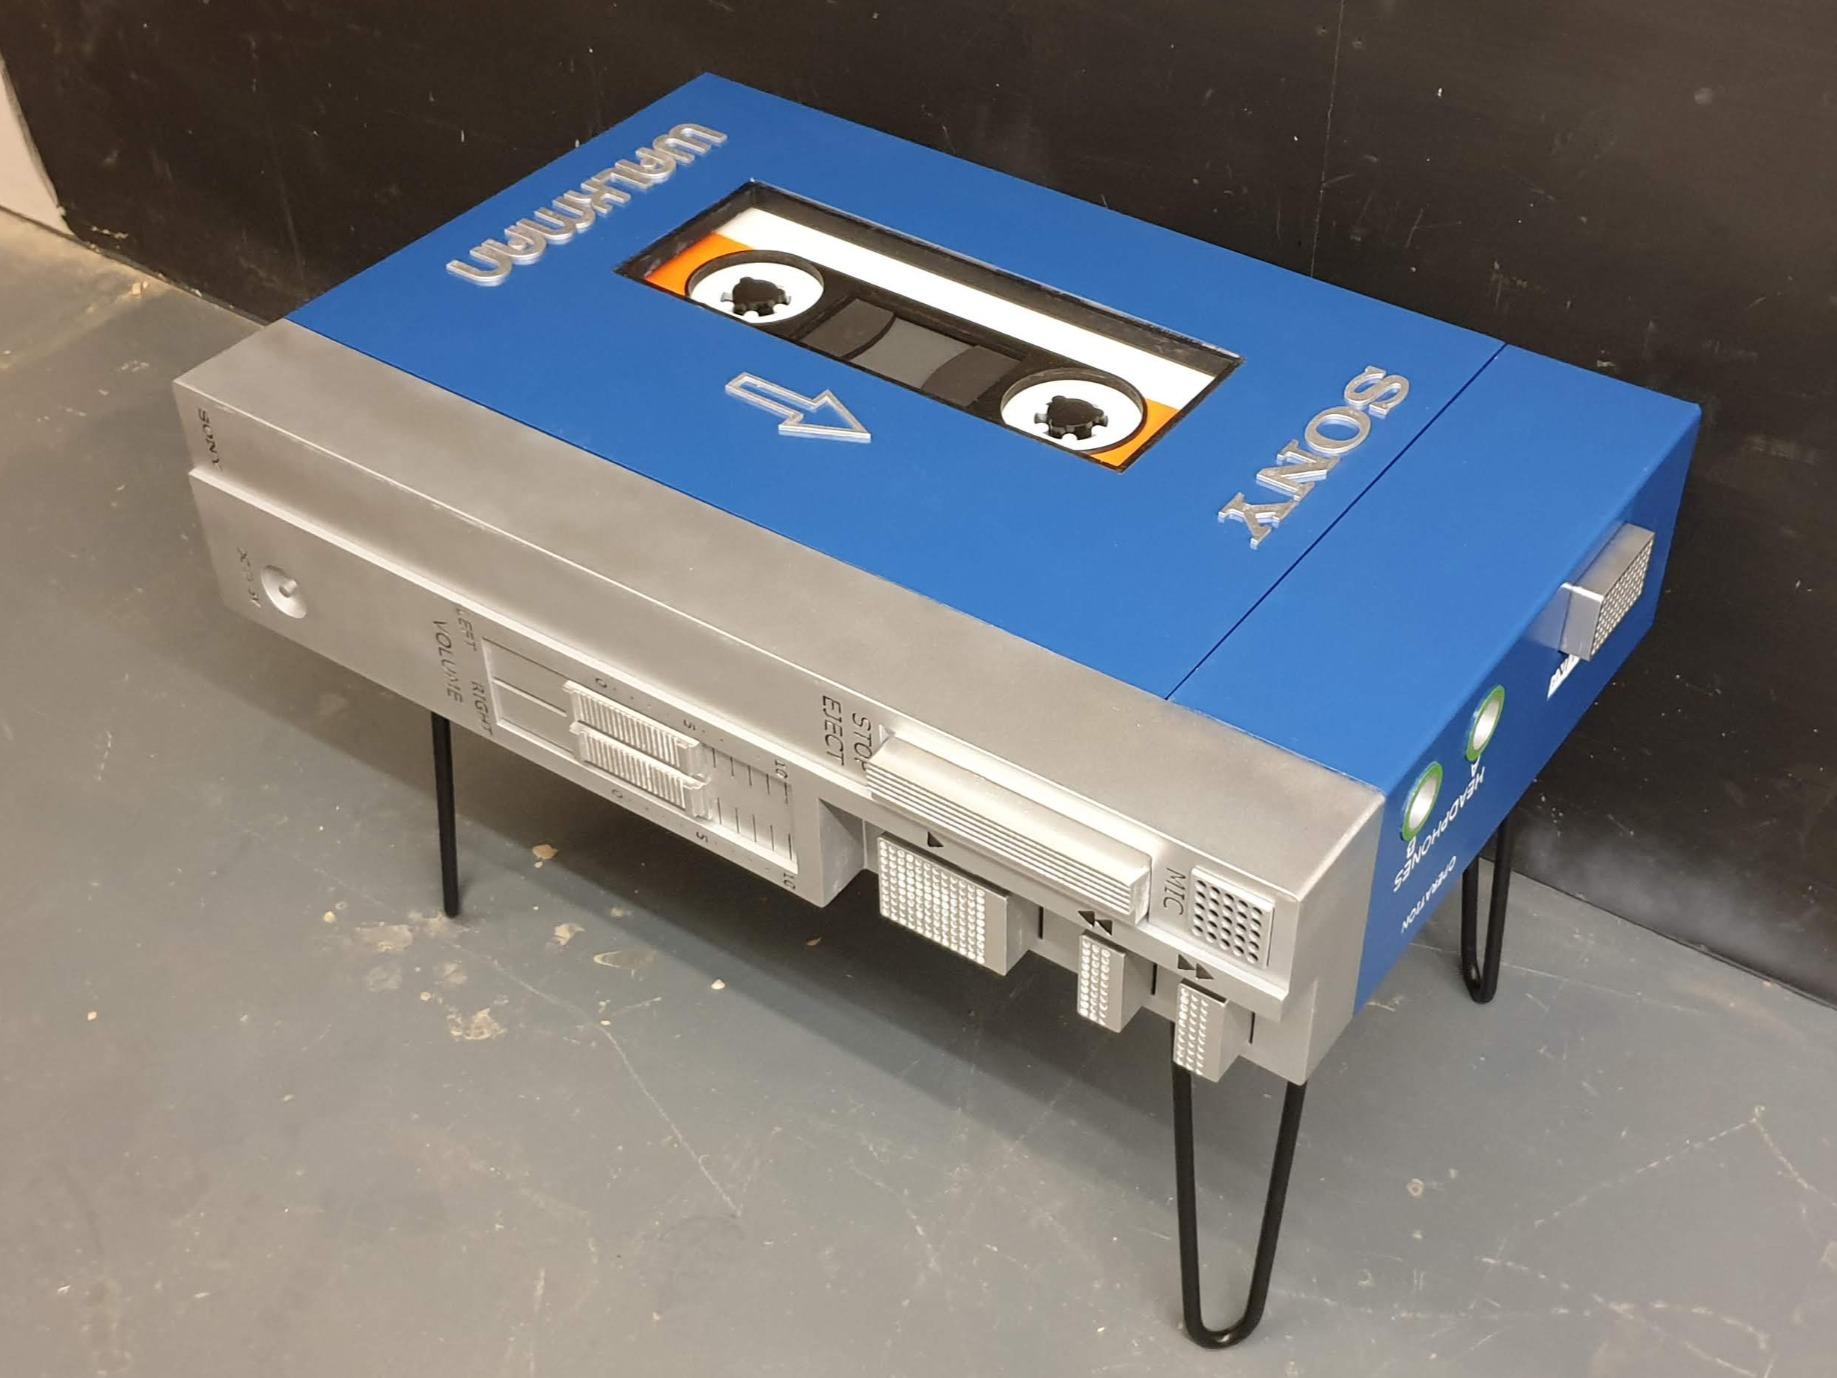 Walkman table